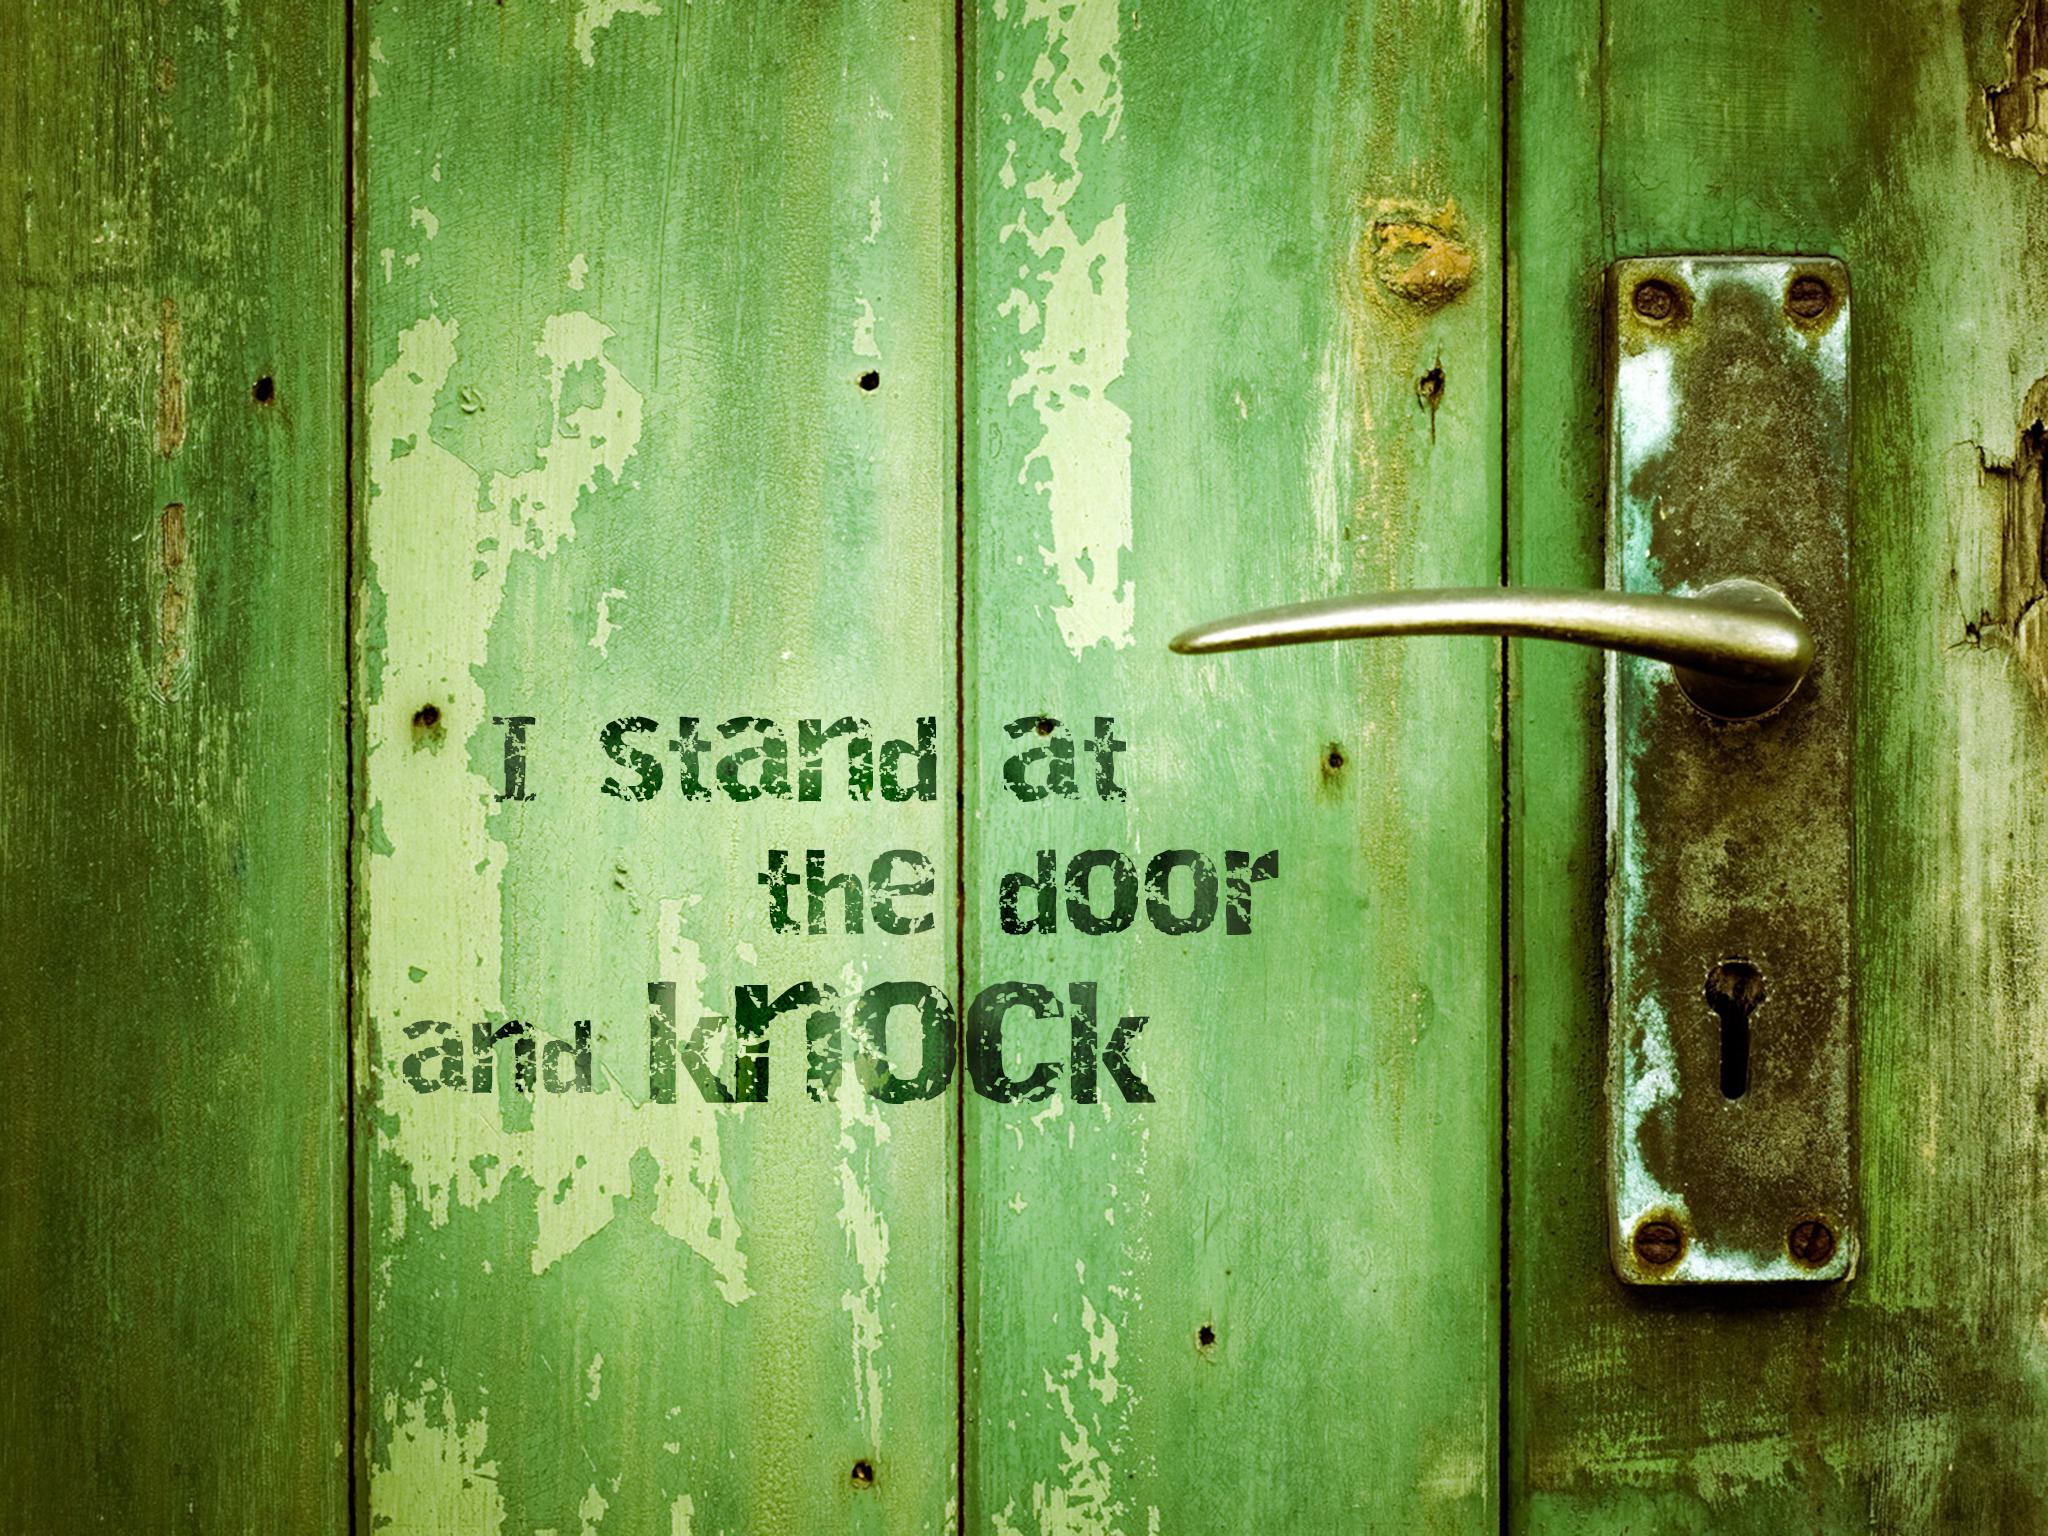 20947 ndash the doors - photo #9